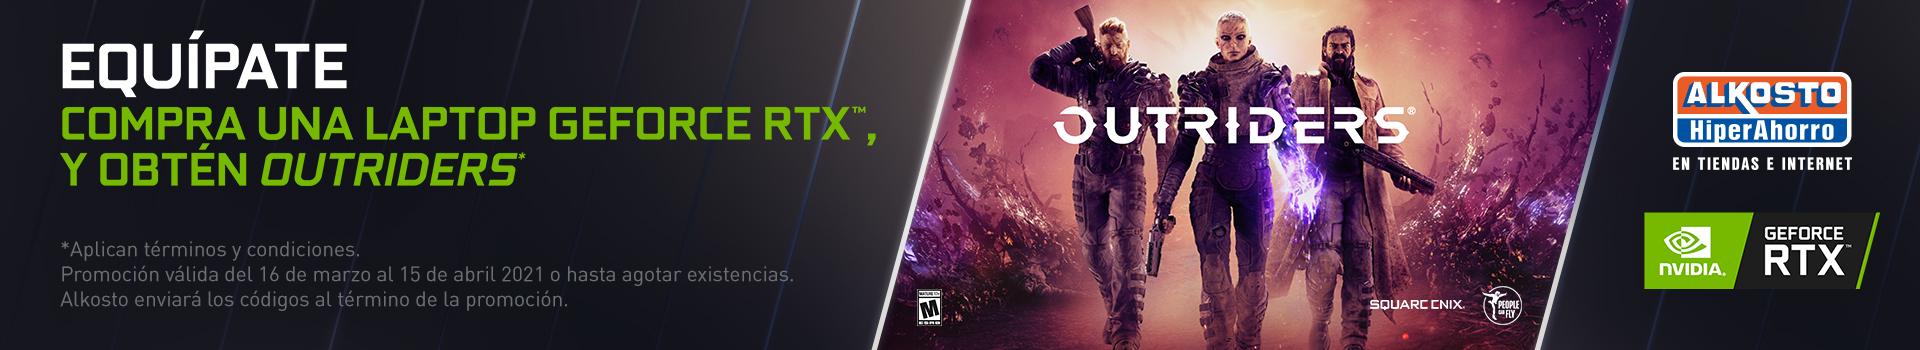 HIPER-AK-KT-5-videojuegos-xboxx-cat-agosto-30-15nov